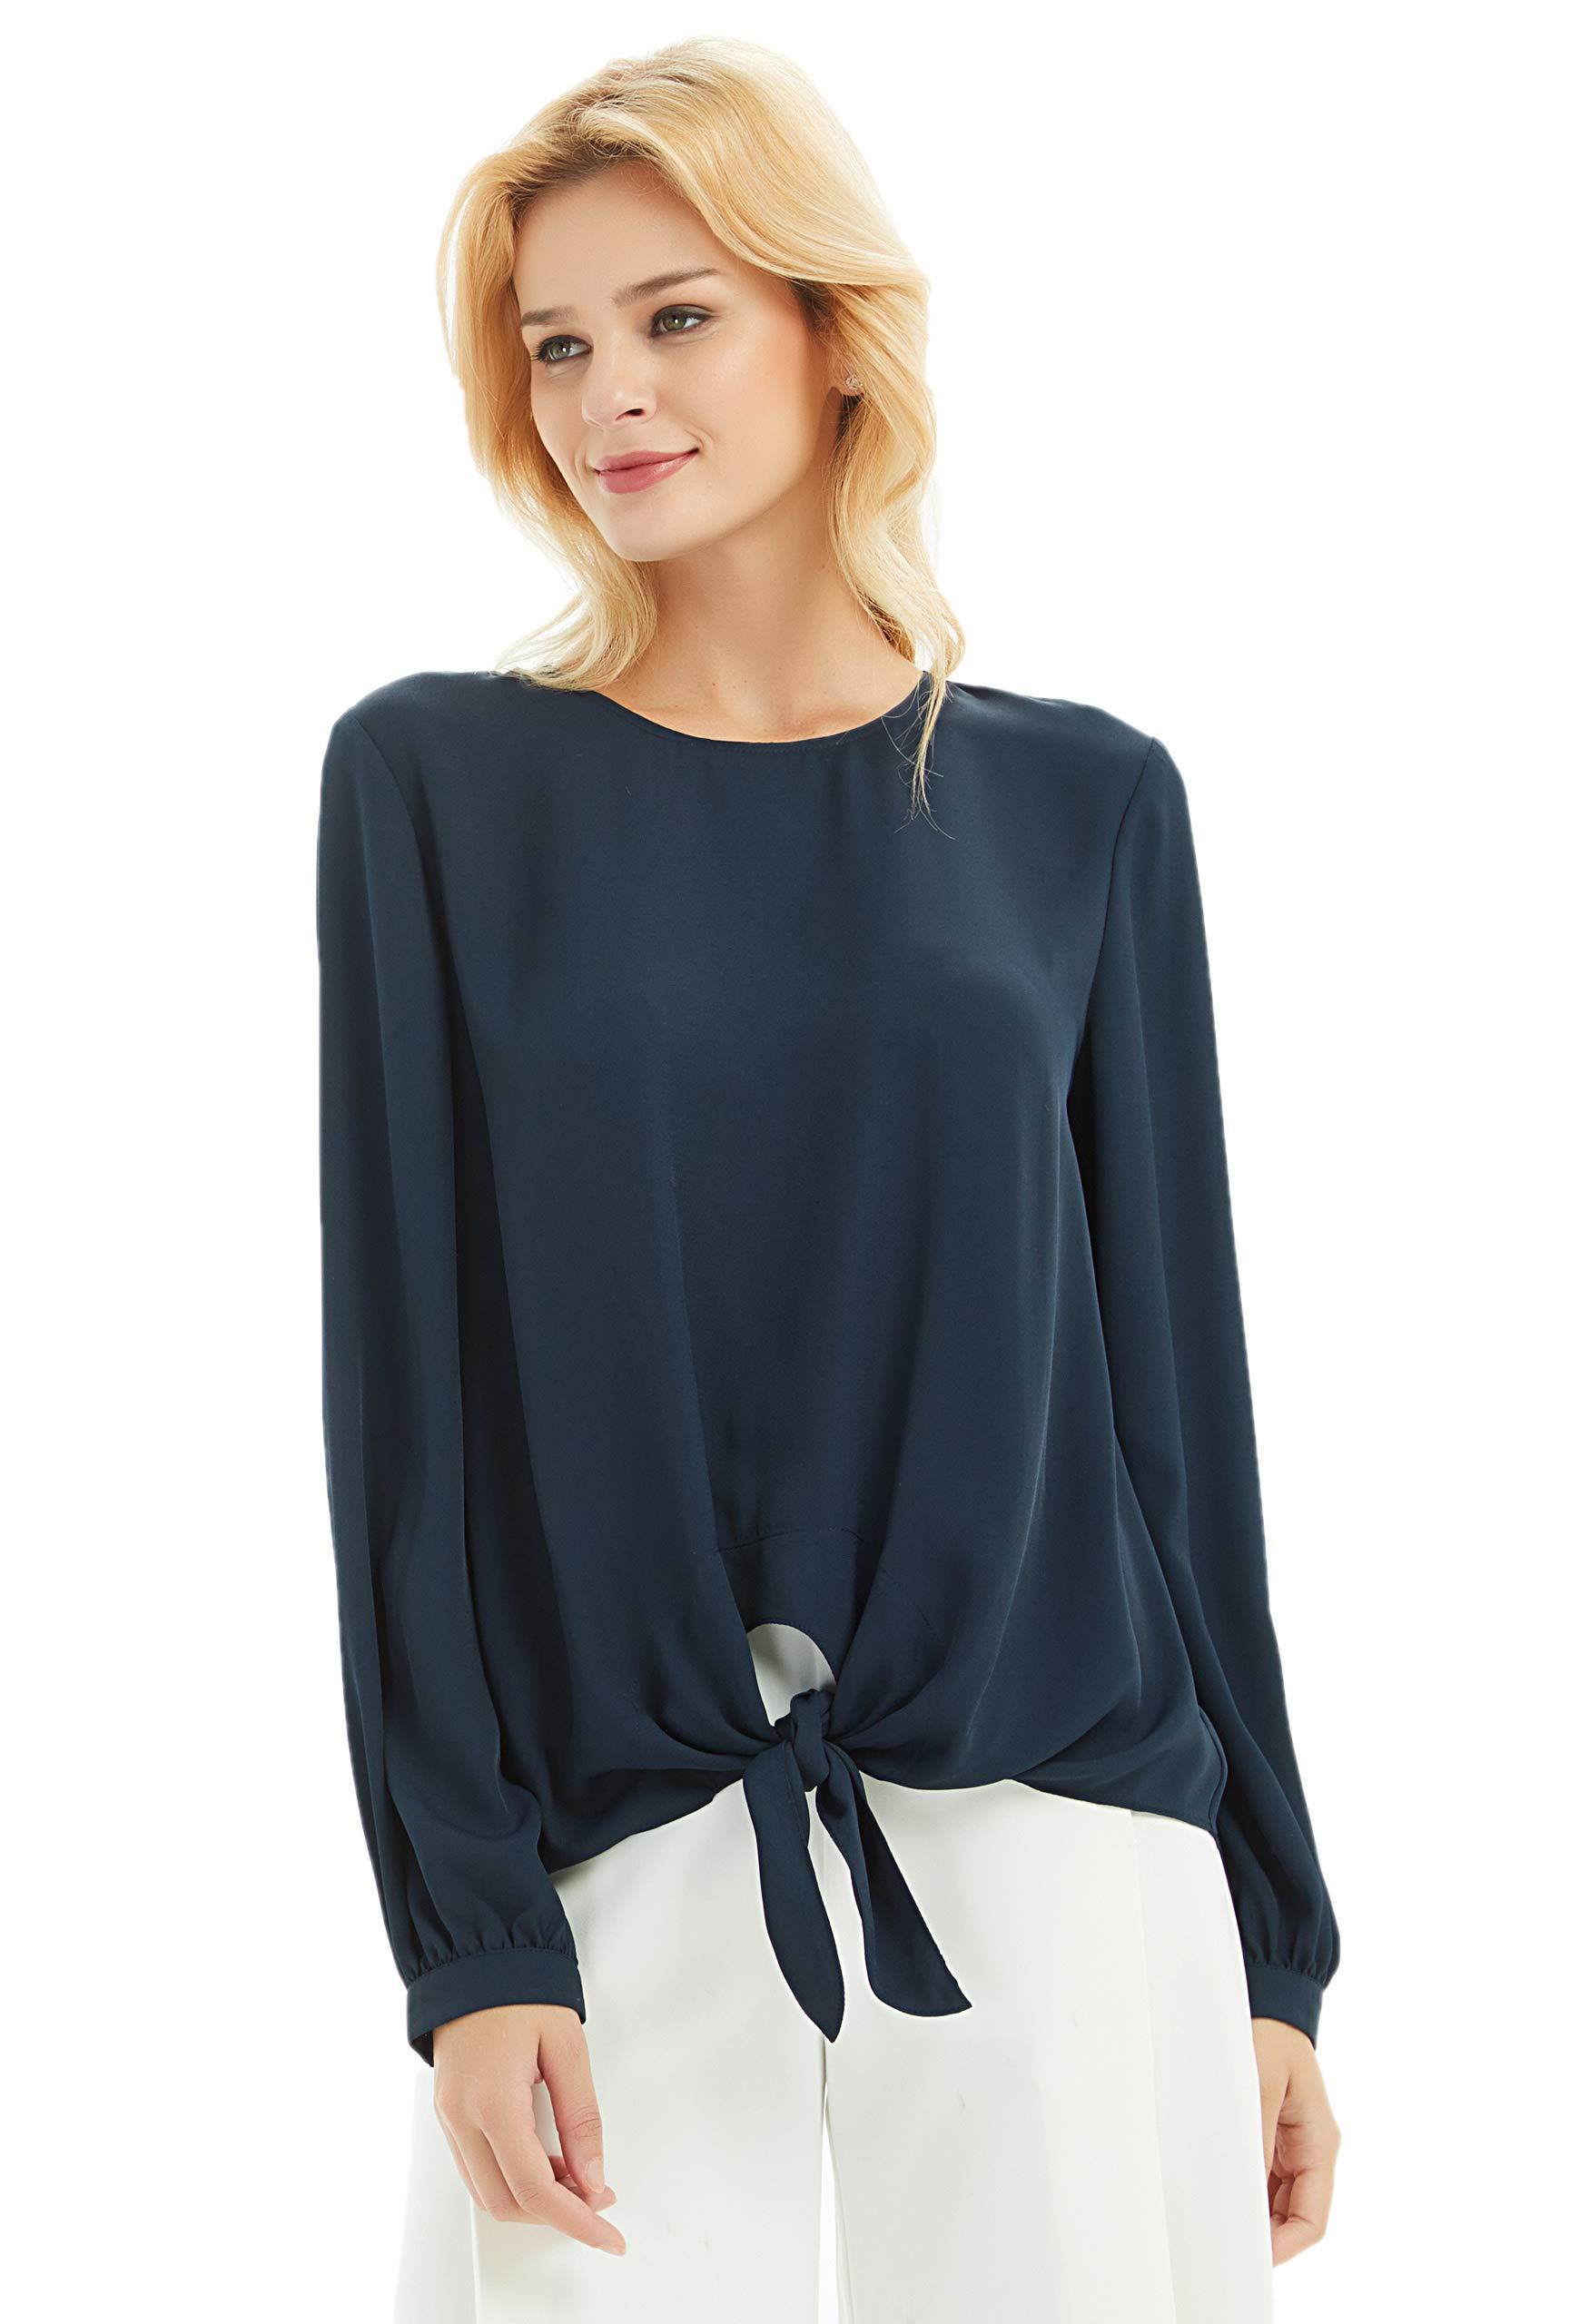 Basic Model Women's Long Sleeve Tie Knot Chiffon Blouse Casual Work T Shirts